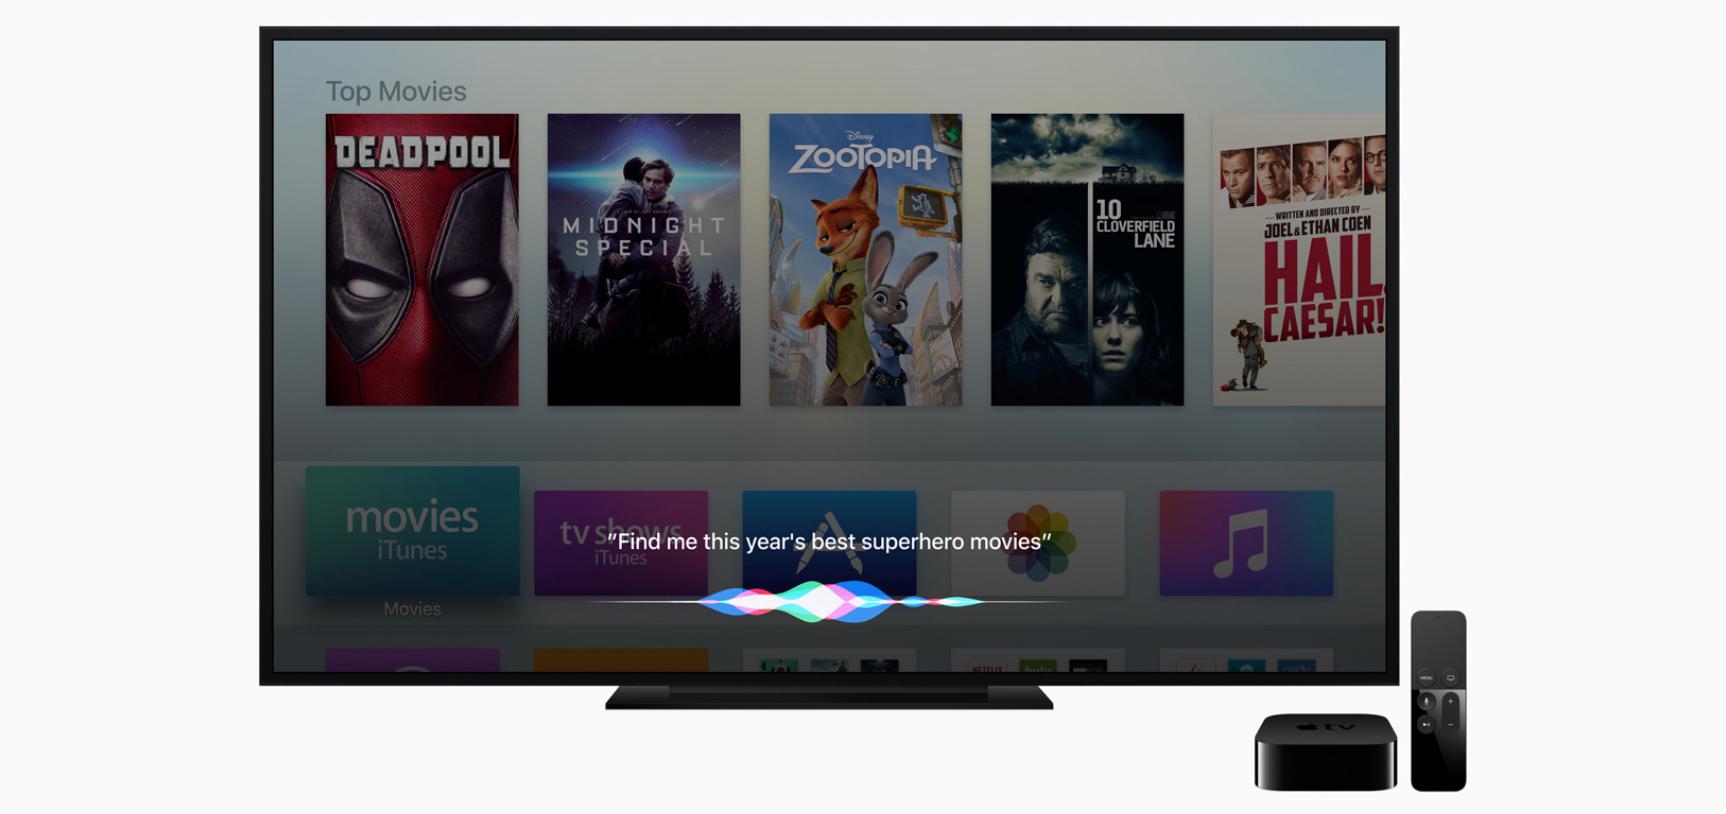 Siri je vedle iOS, macOS a watchOS dostupná i na Apple TV v rámci tvOS